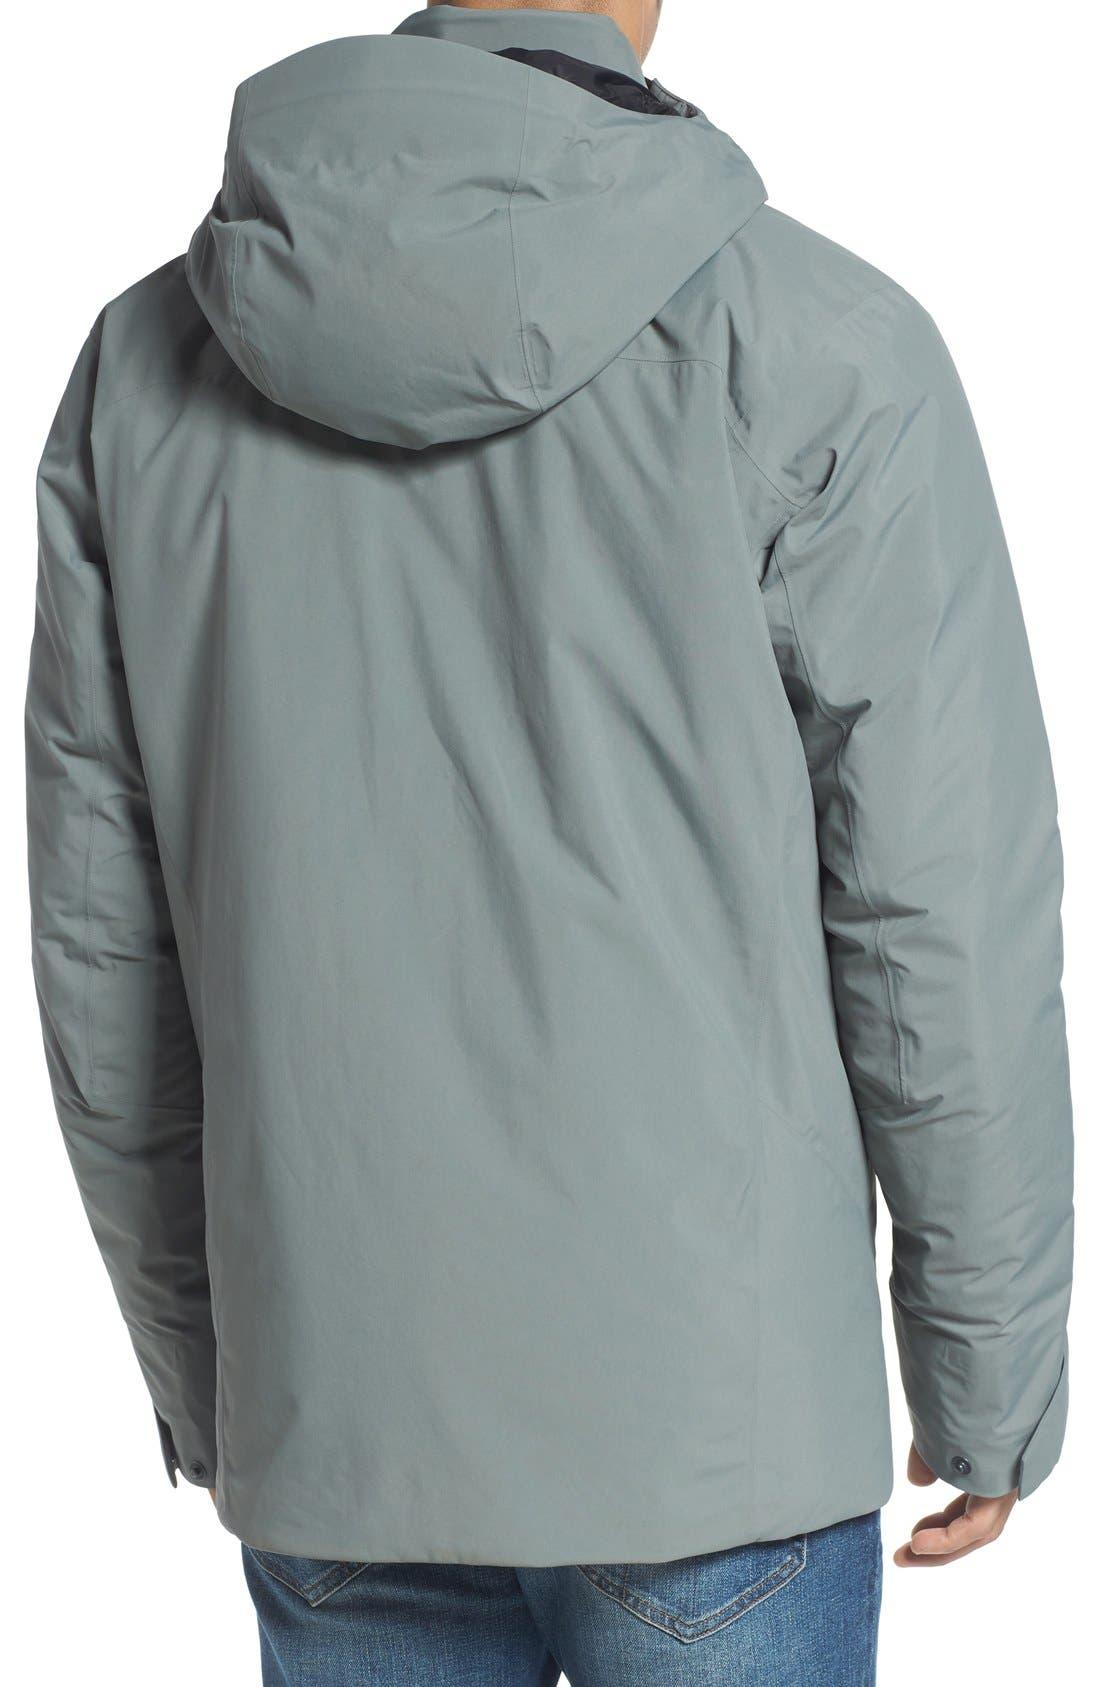 'Koda' Hooded Waterproof Shell Jacket,                             Alternate thumbnail 2, color,                             Autobahn